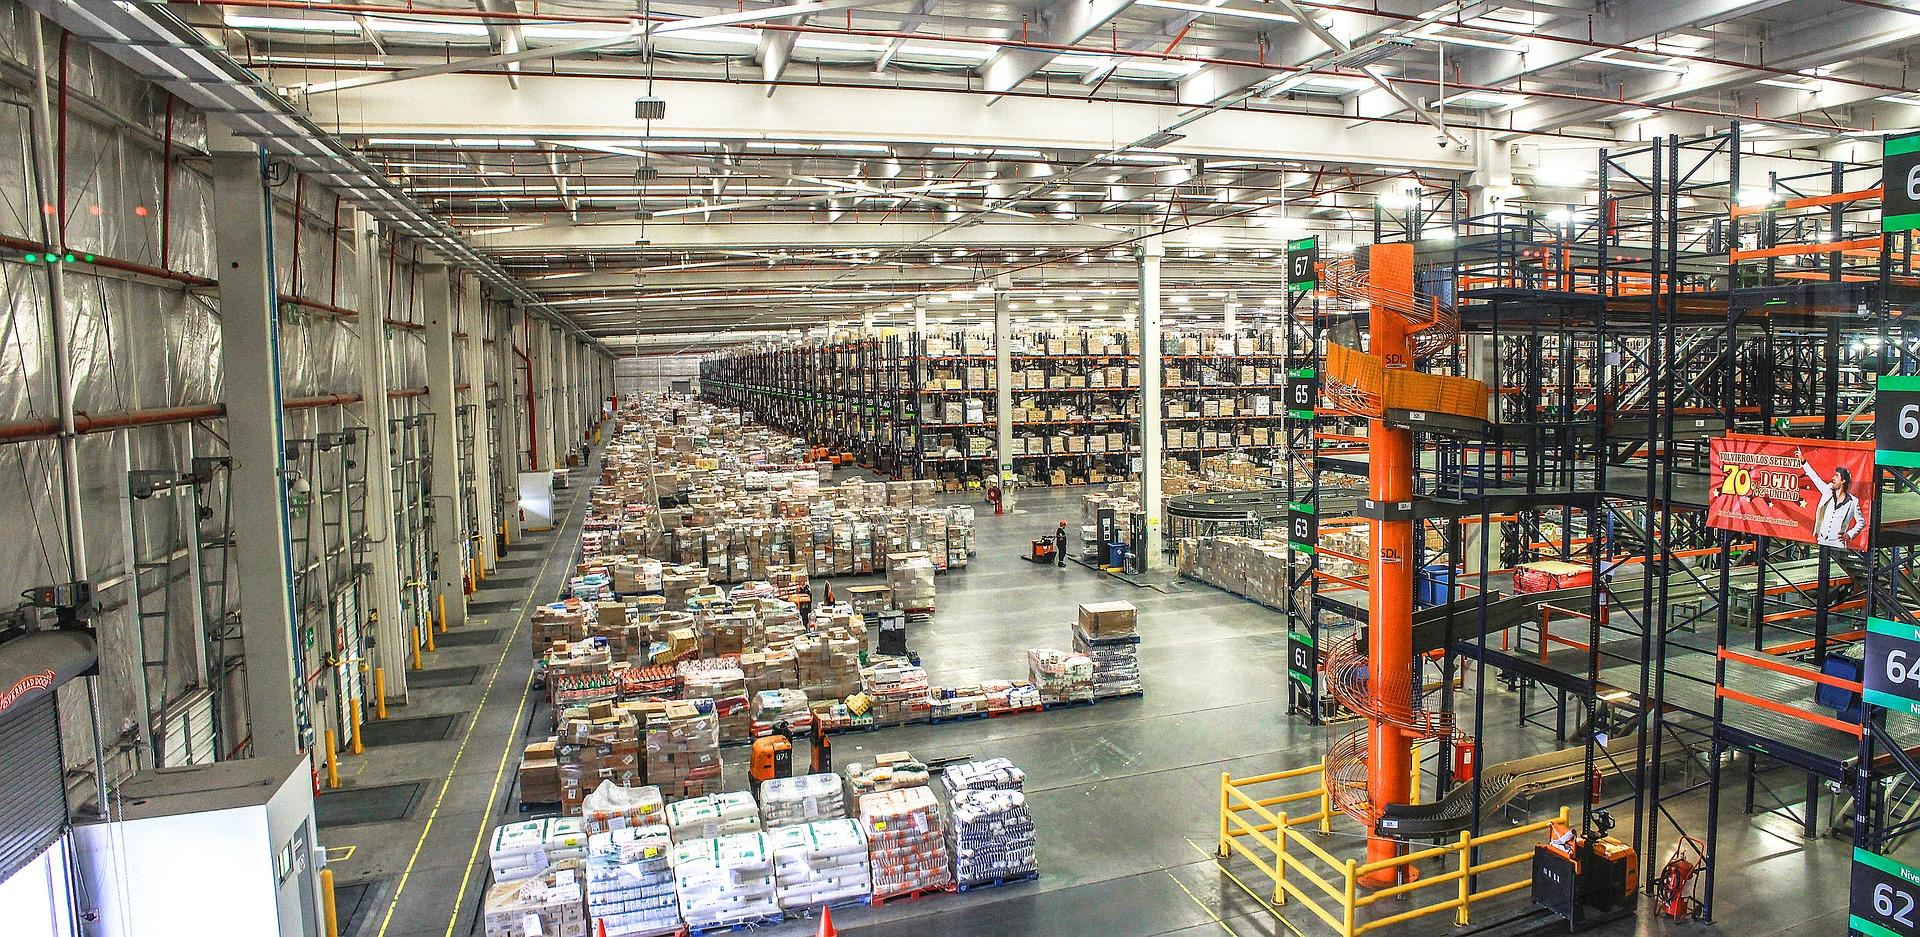 20171208 - distribution center.jpg